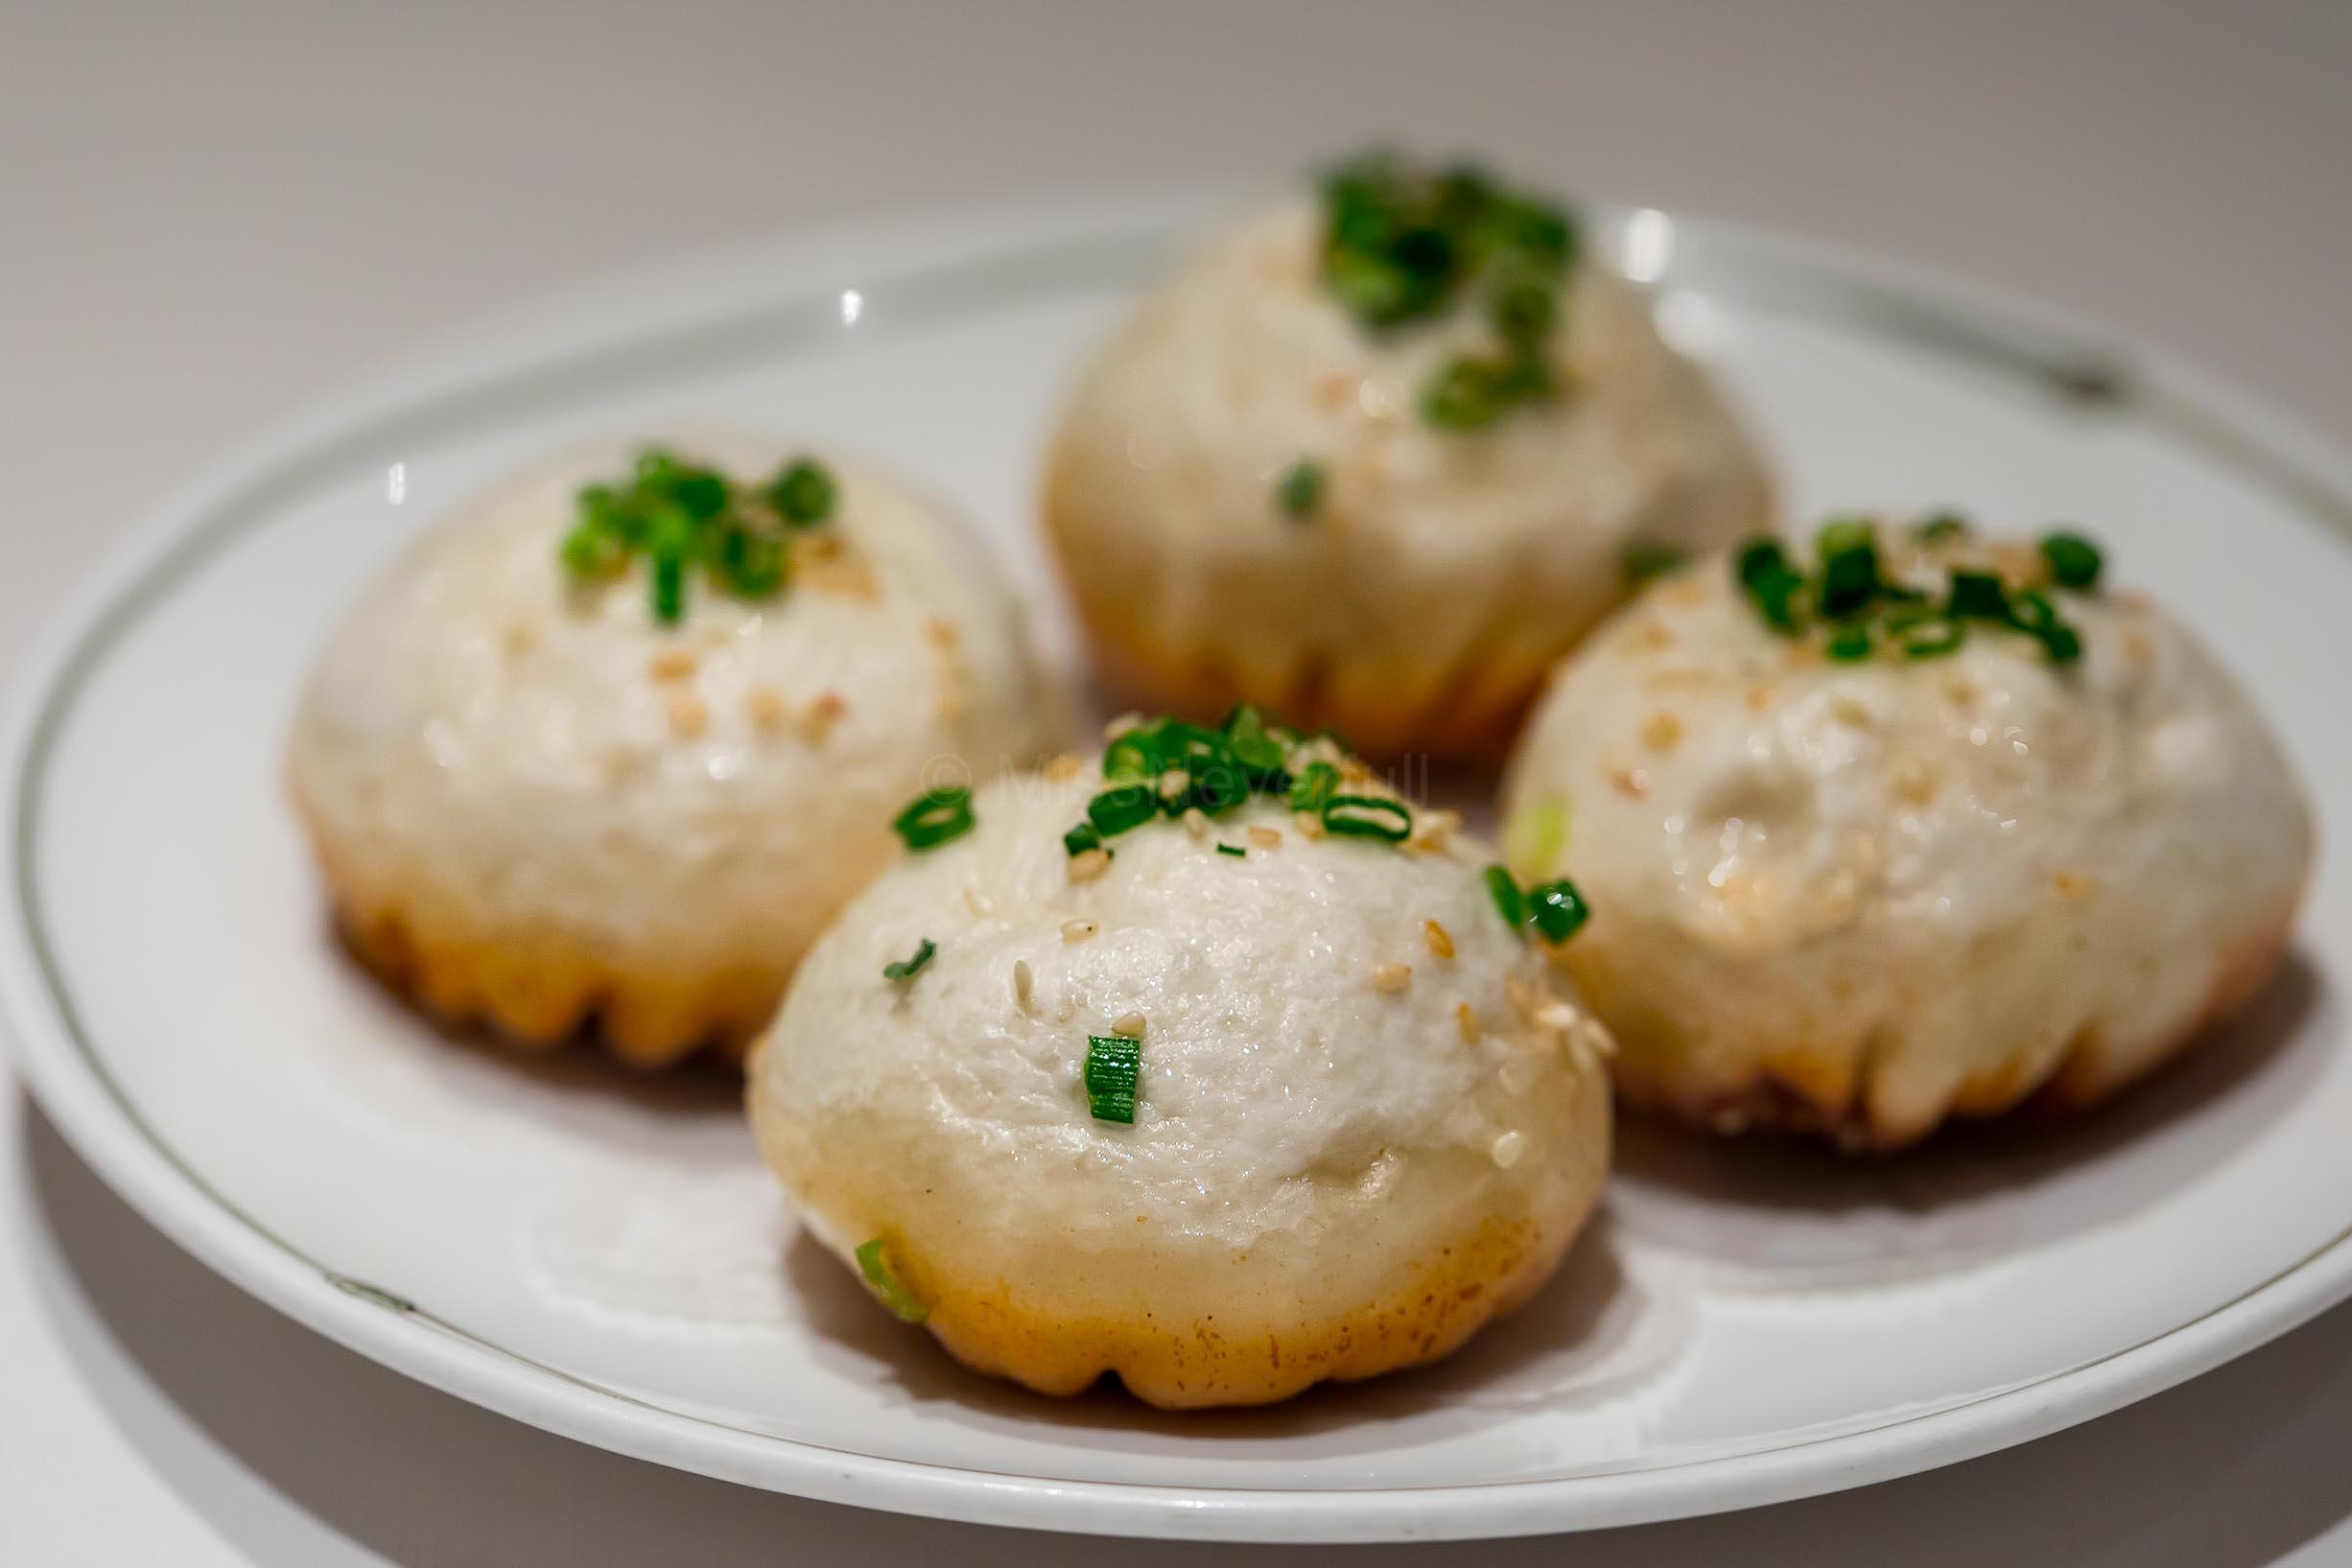 上海生煎包 Shanghainese Pan-Pried Buns